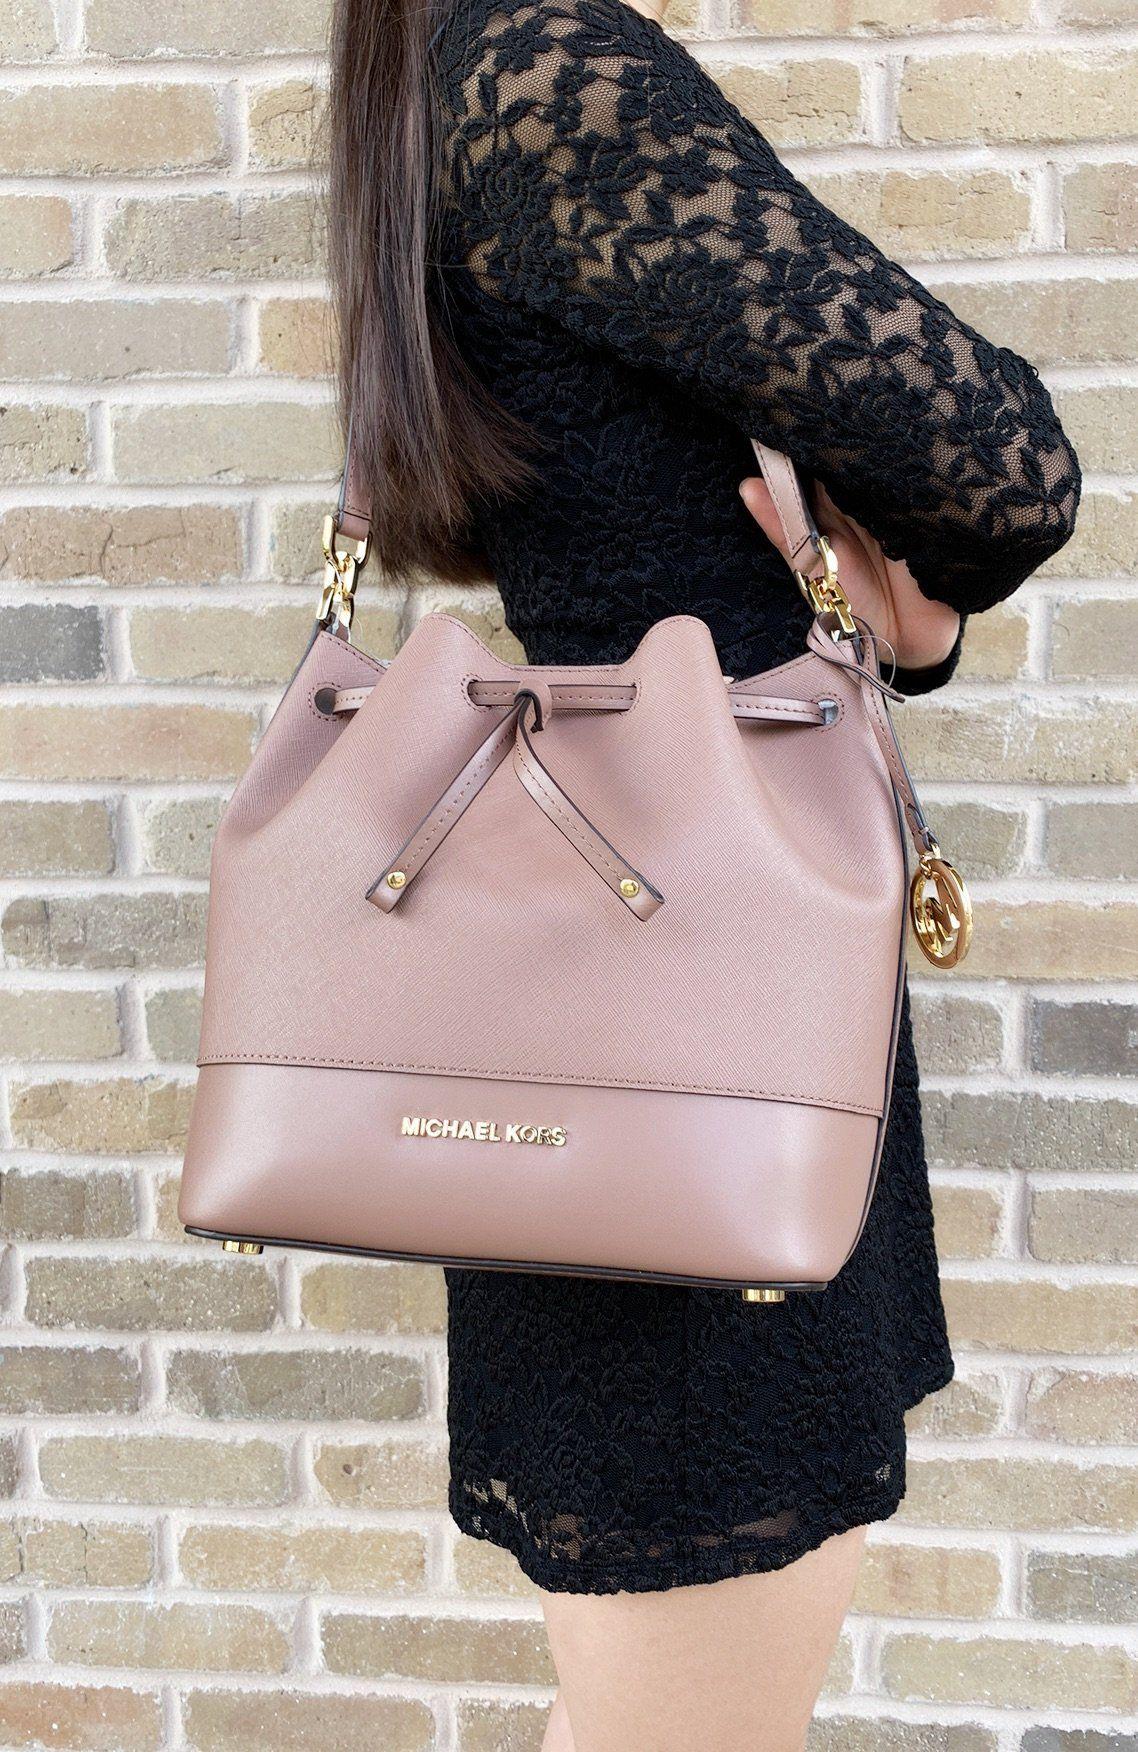 993790c2312c Michael Kors Trista Medium Bucket Bag Dusty Rose Saffiano Leather   poshcloset  poshpackages  mercariseller  poshboss  MK  ebayseller   amazonfashion  mercari ...